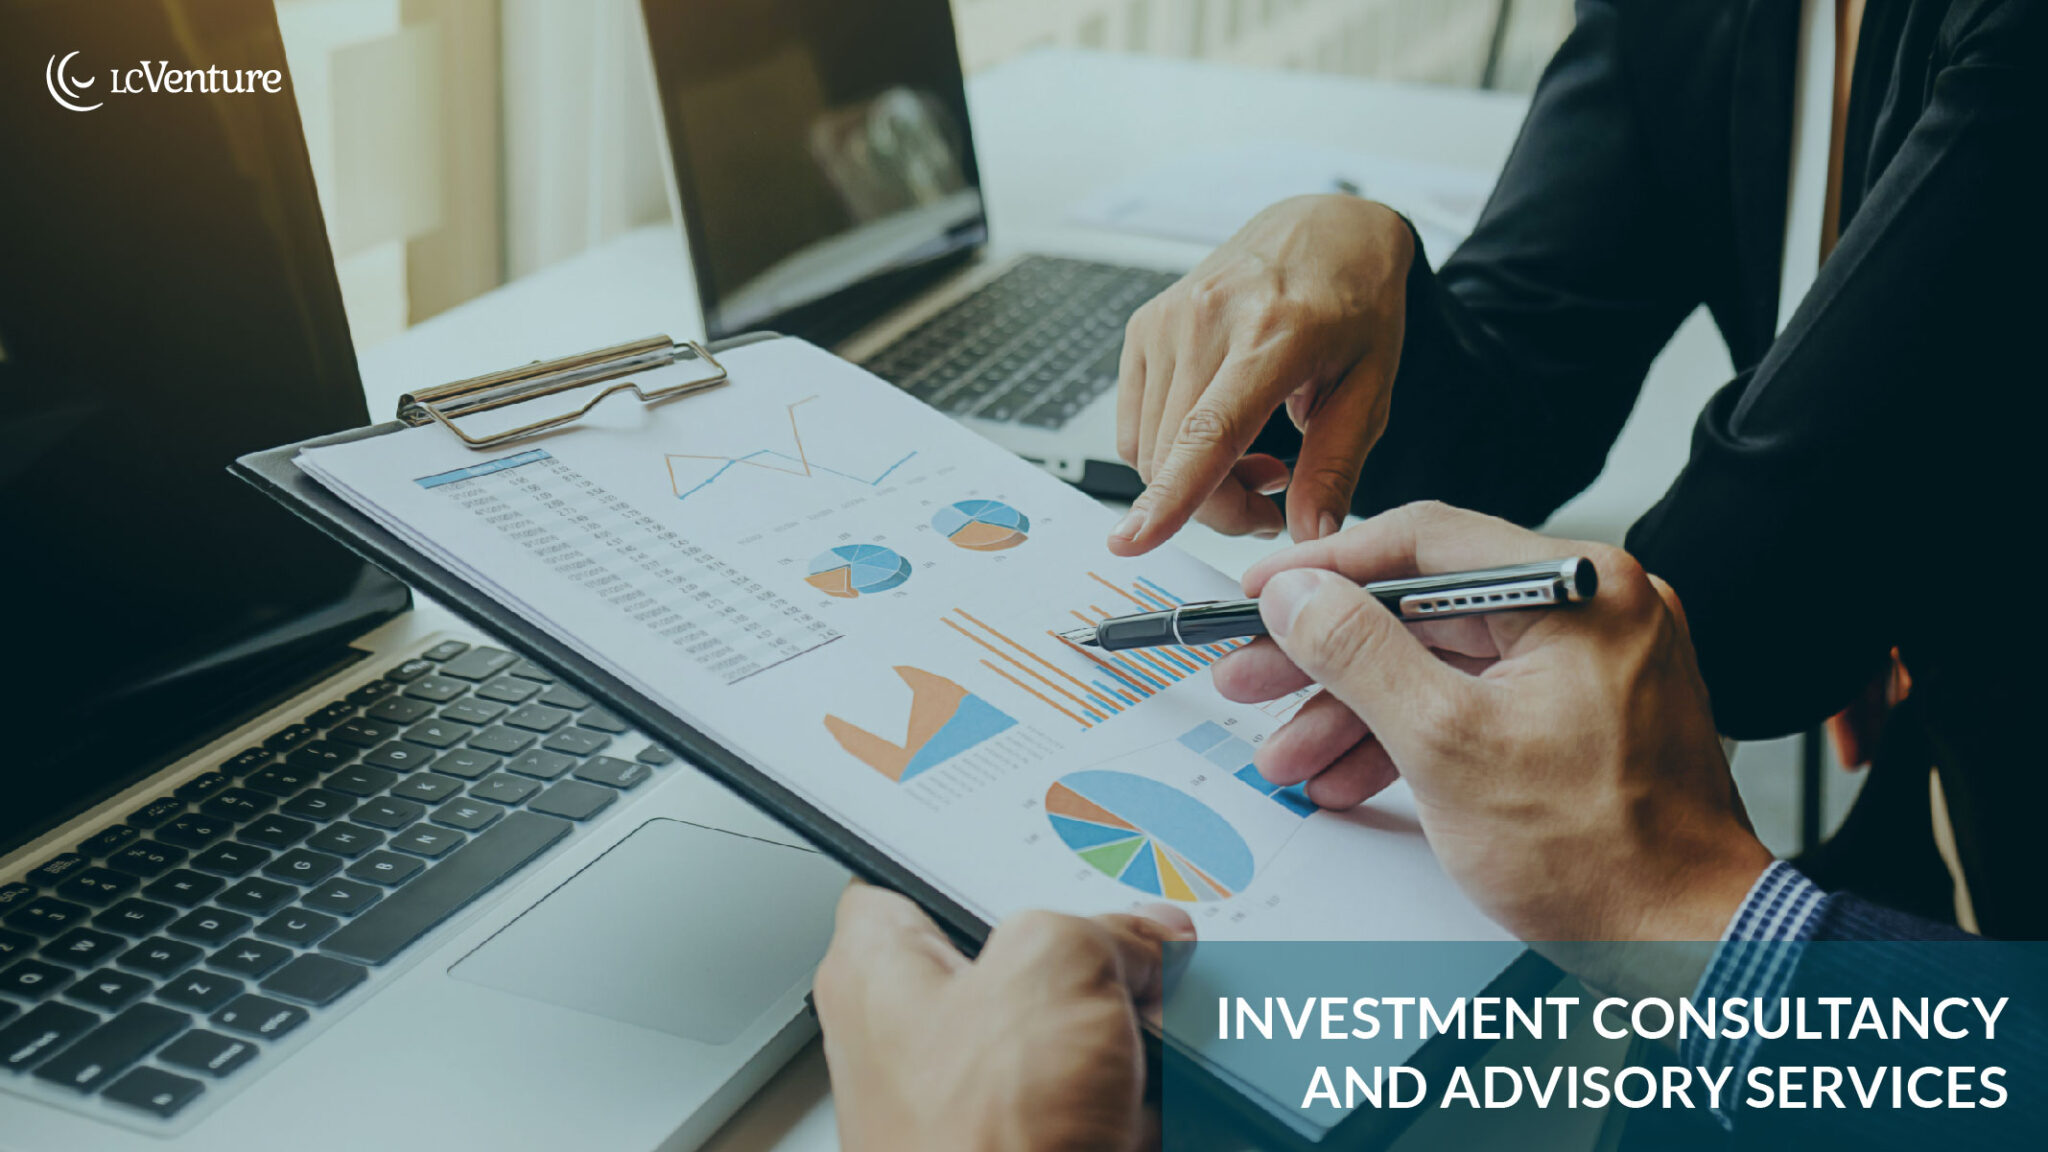 LC Venture Investment advisory services